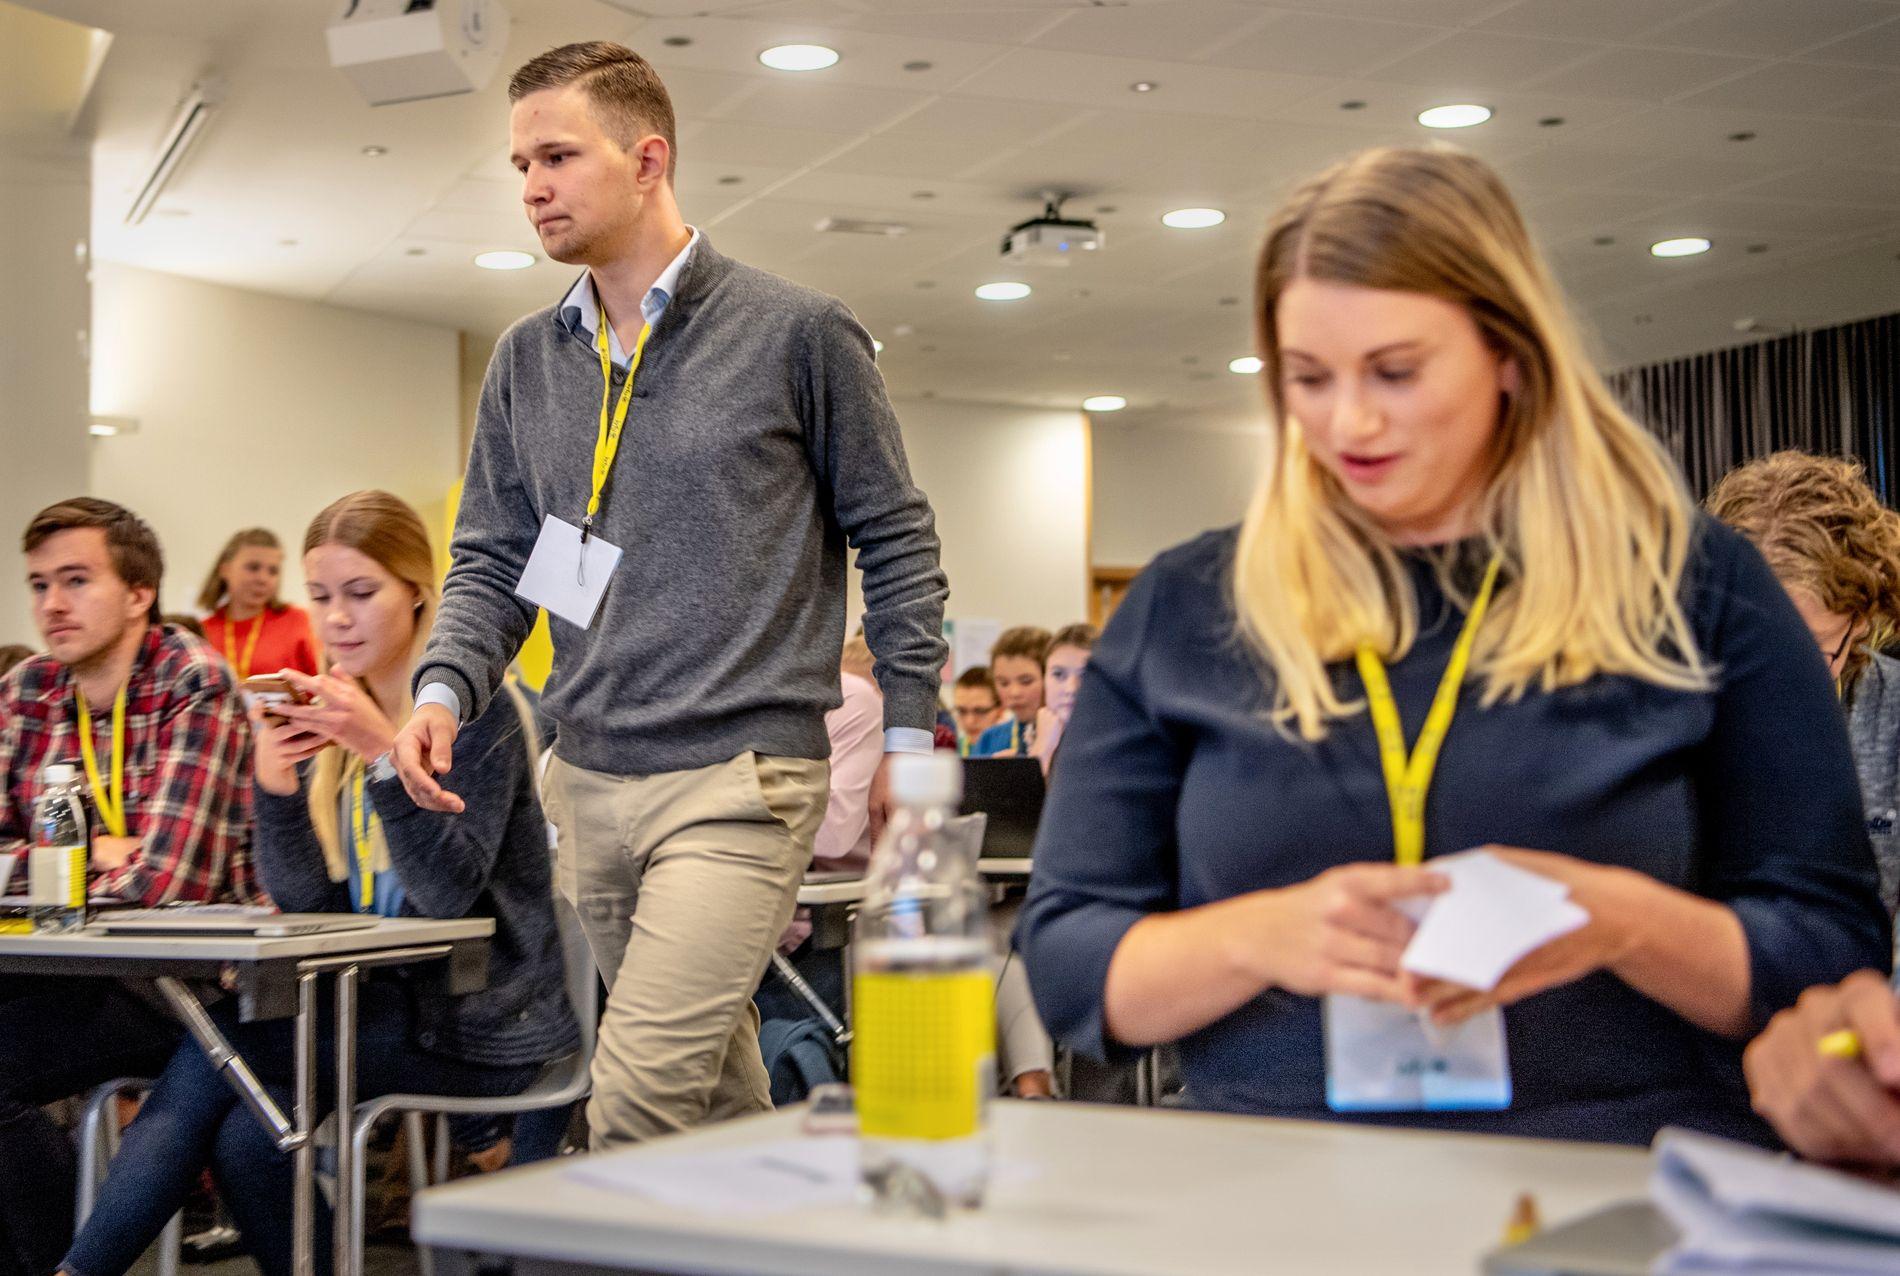 STEMMER ULIKT: Nestledere i KrFU, Nikolai Berglund Skogan vil stemme i tråd med partileder Knut Arild Hareides råd til KrFs, i strid med KrFU-leder Martine Tønnessen, som mener ungdomspartiet må følge eget regjeringsvedtak.